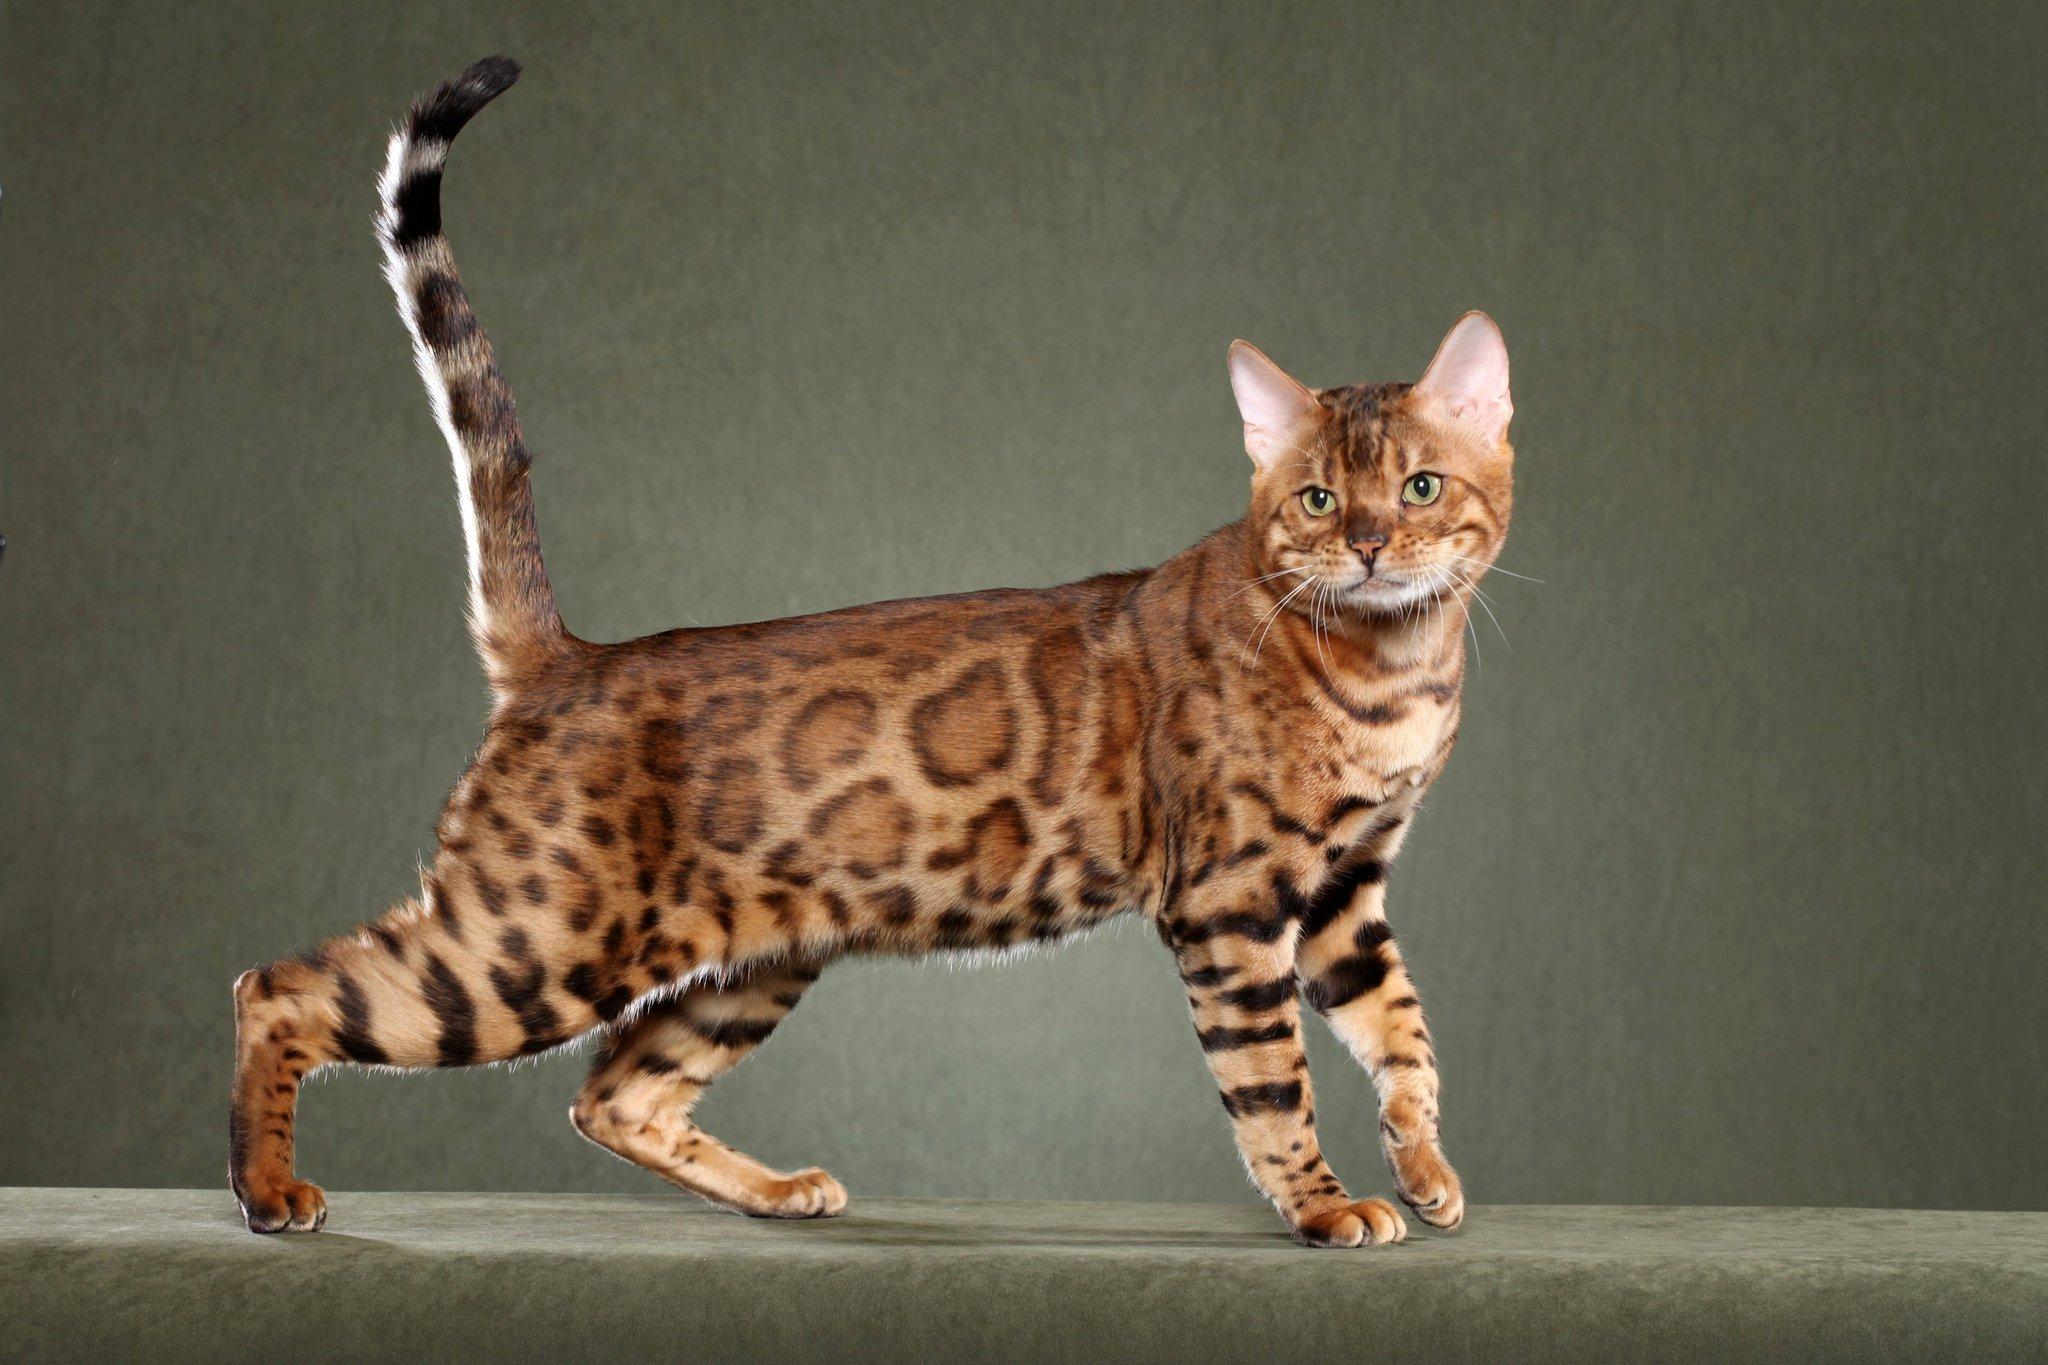 https://1000kotov.ru/wp-content/uploads/2015/03/Cool-Bengal-Cat-Image-04-Animal-Wallpaper.jpg